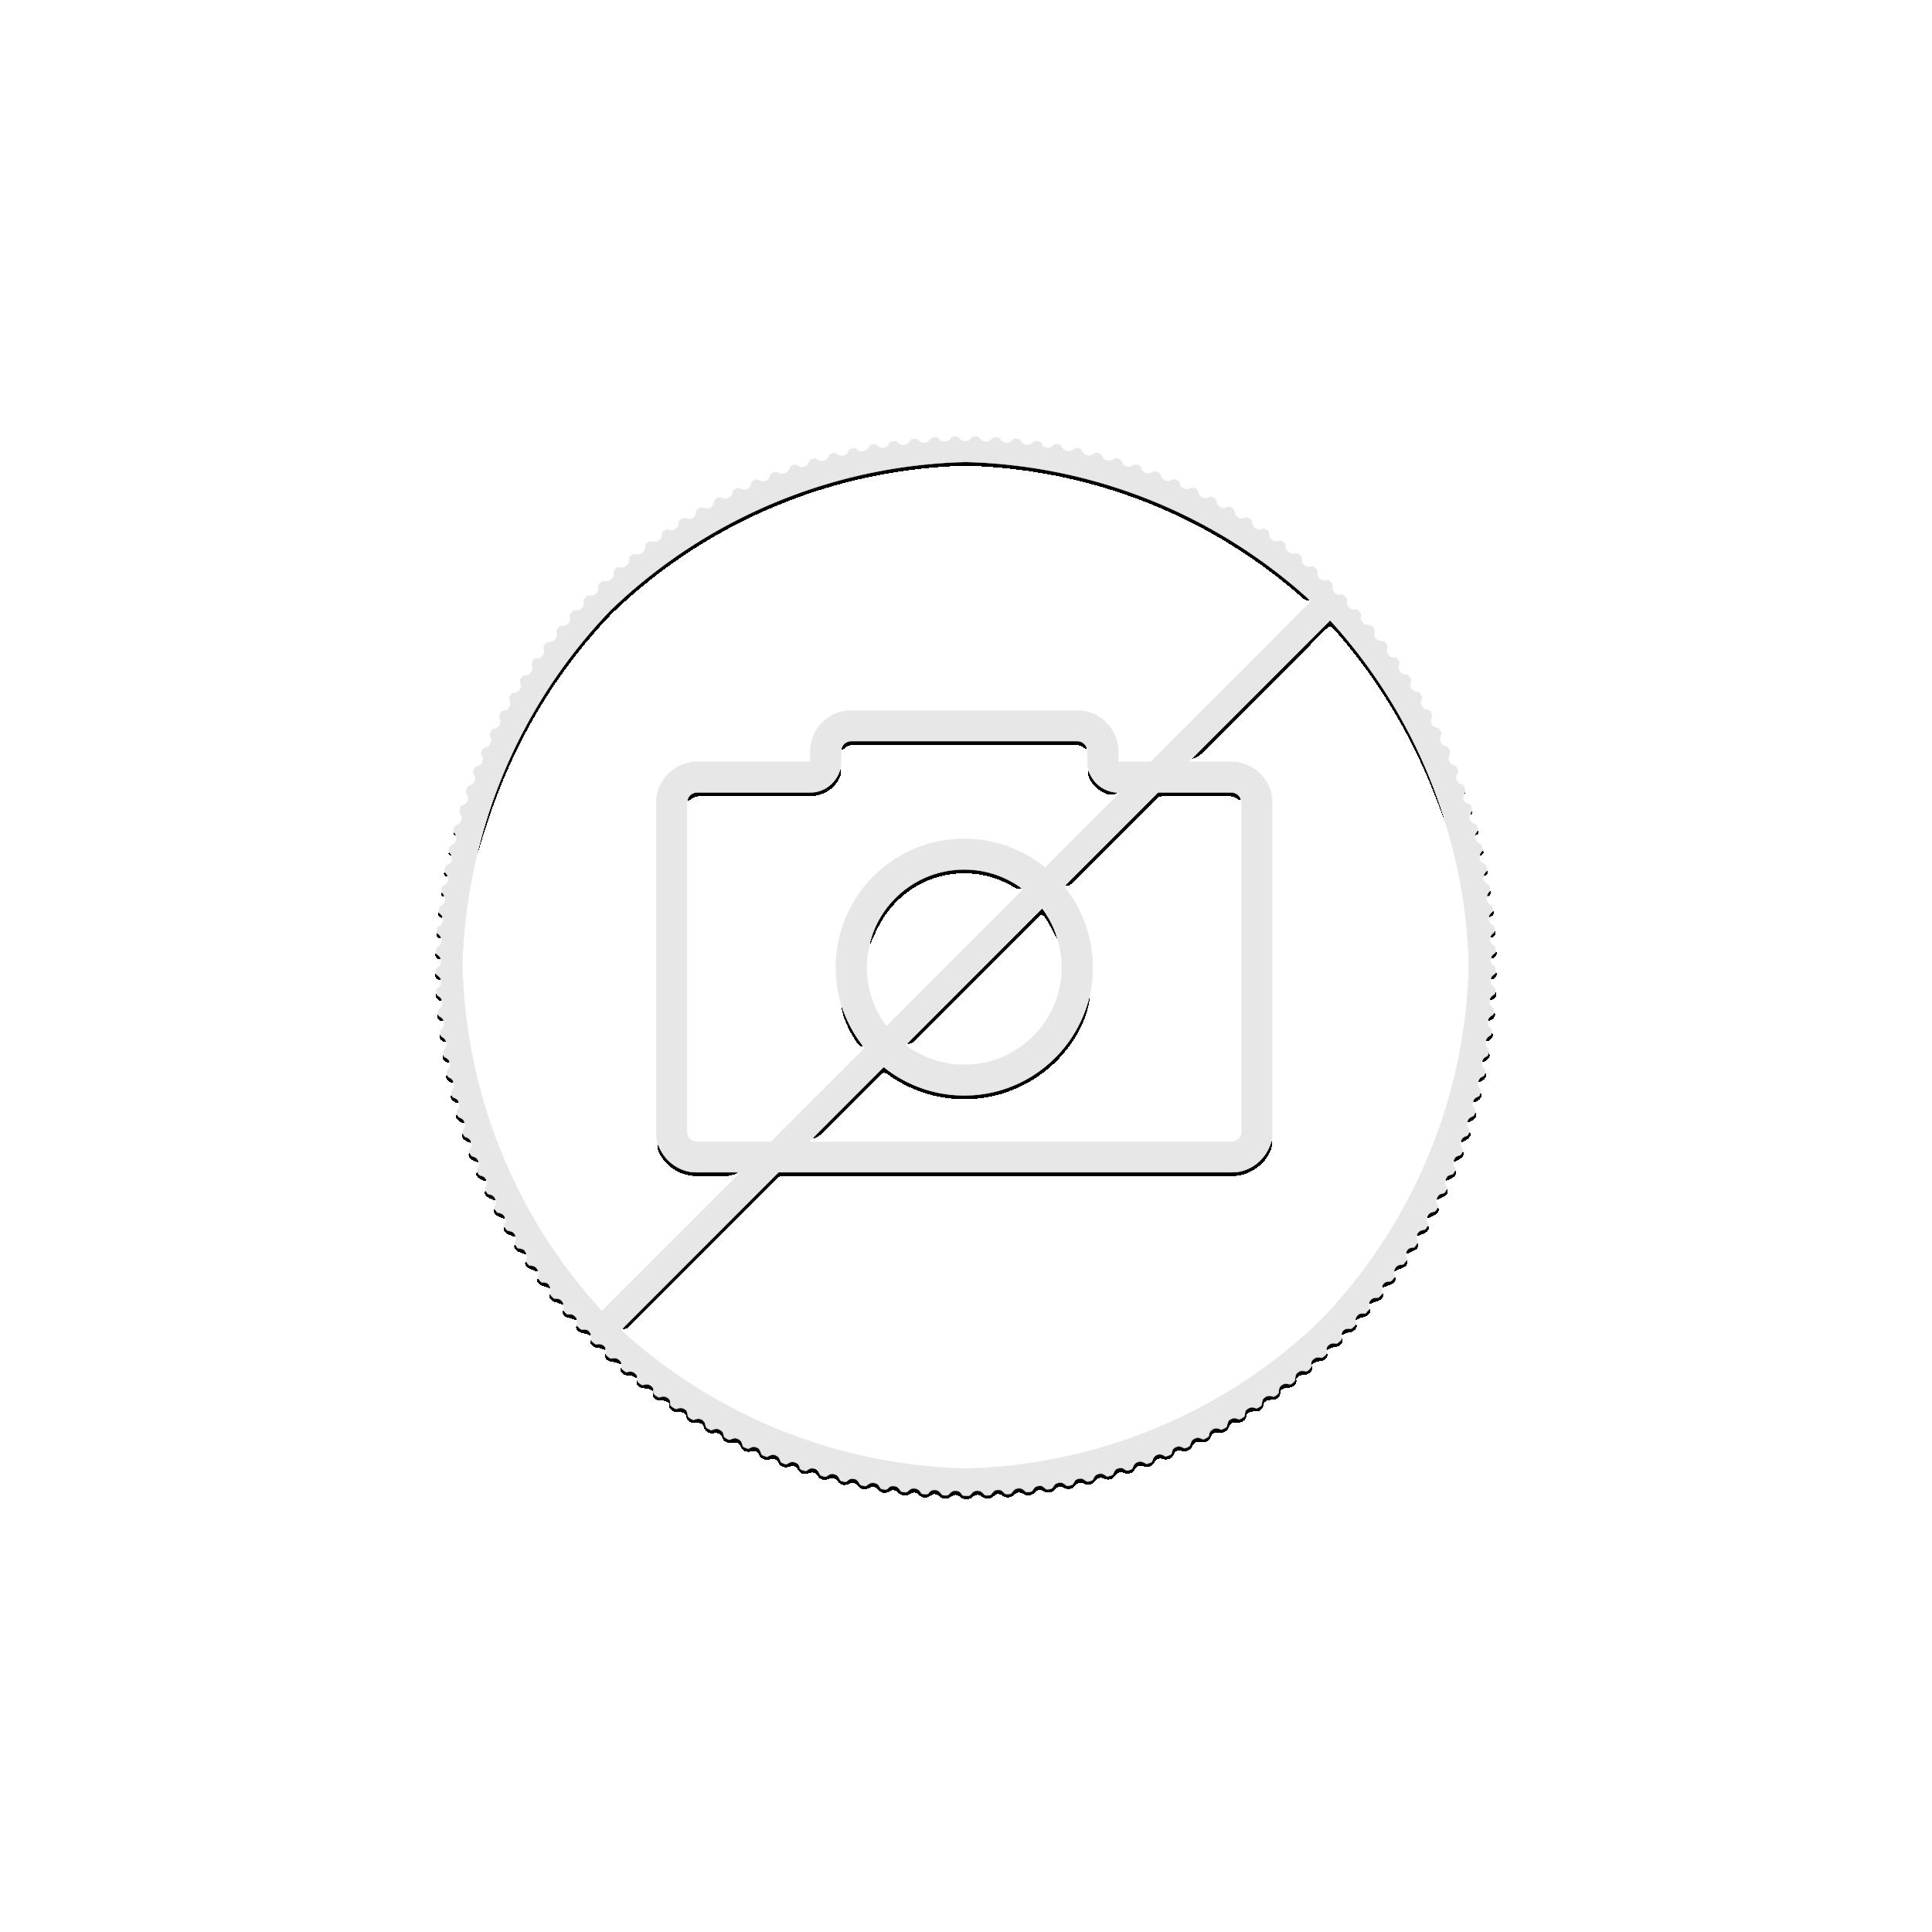 1 troy ounce gouden Krugerrand munt 2021